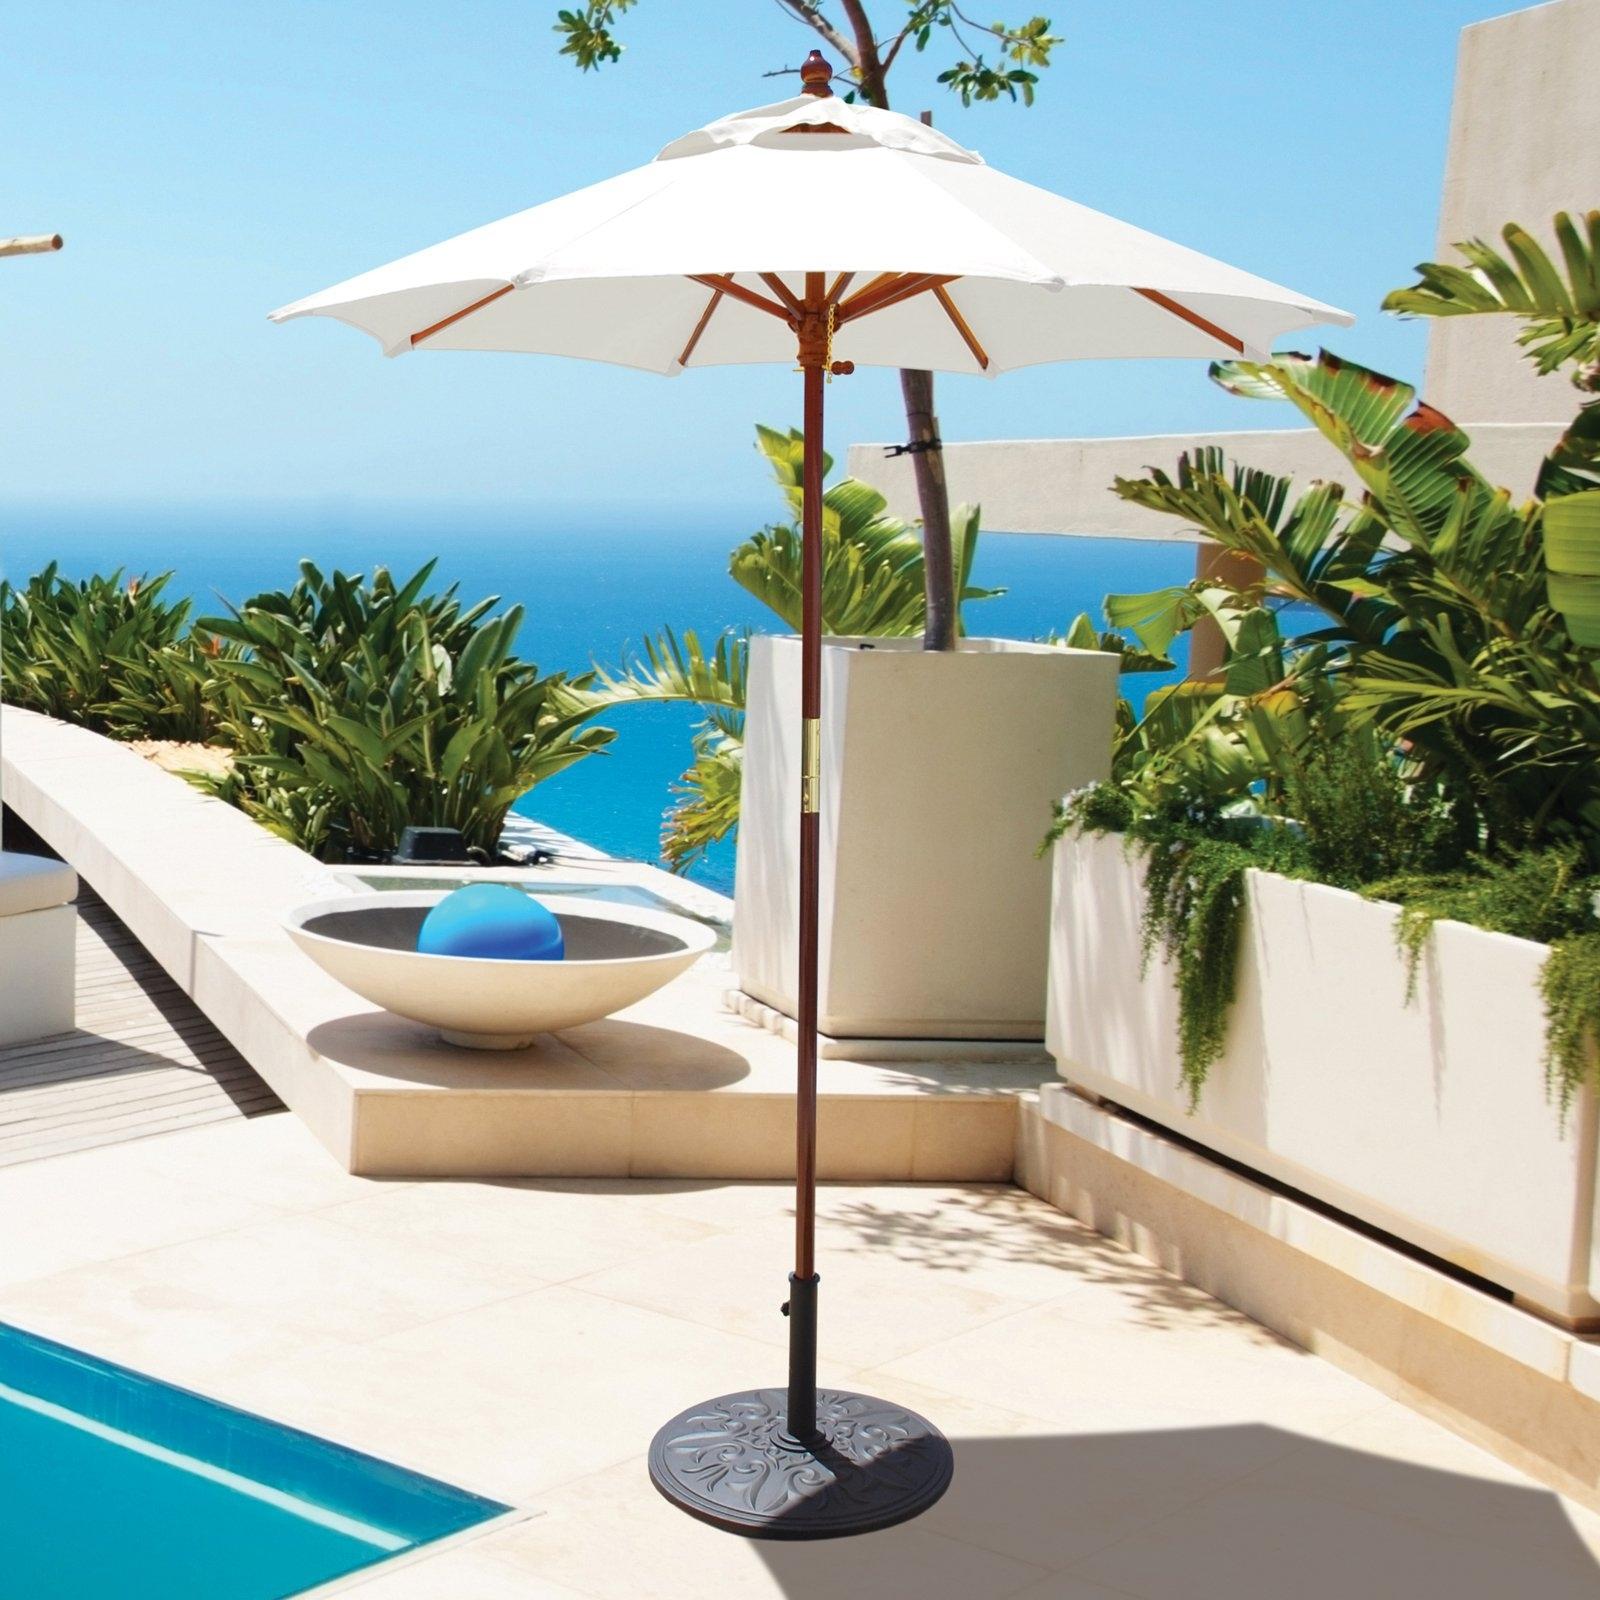 6 Ft Patio Umbrellas For Popular Galtech 6 Ft. Wood Cafe Sunbrella Market Umbrella (Gallery 5 of 20)